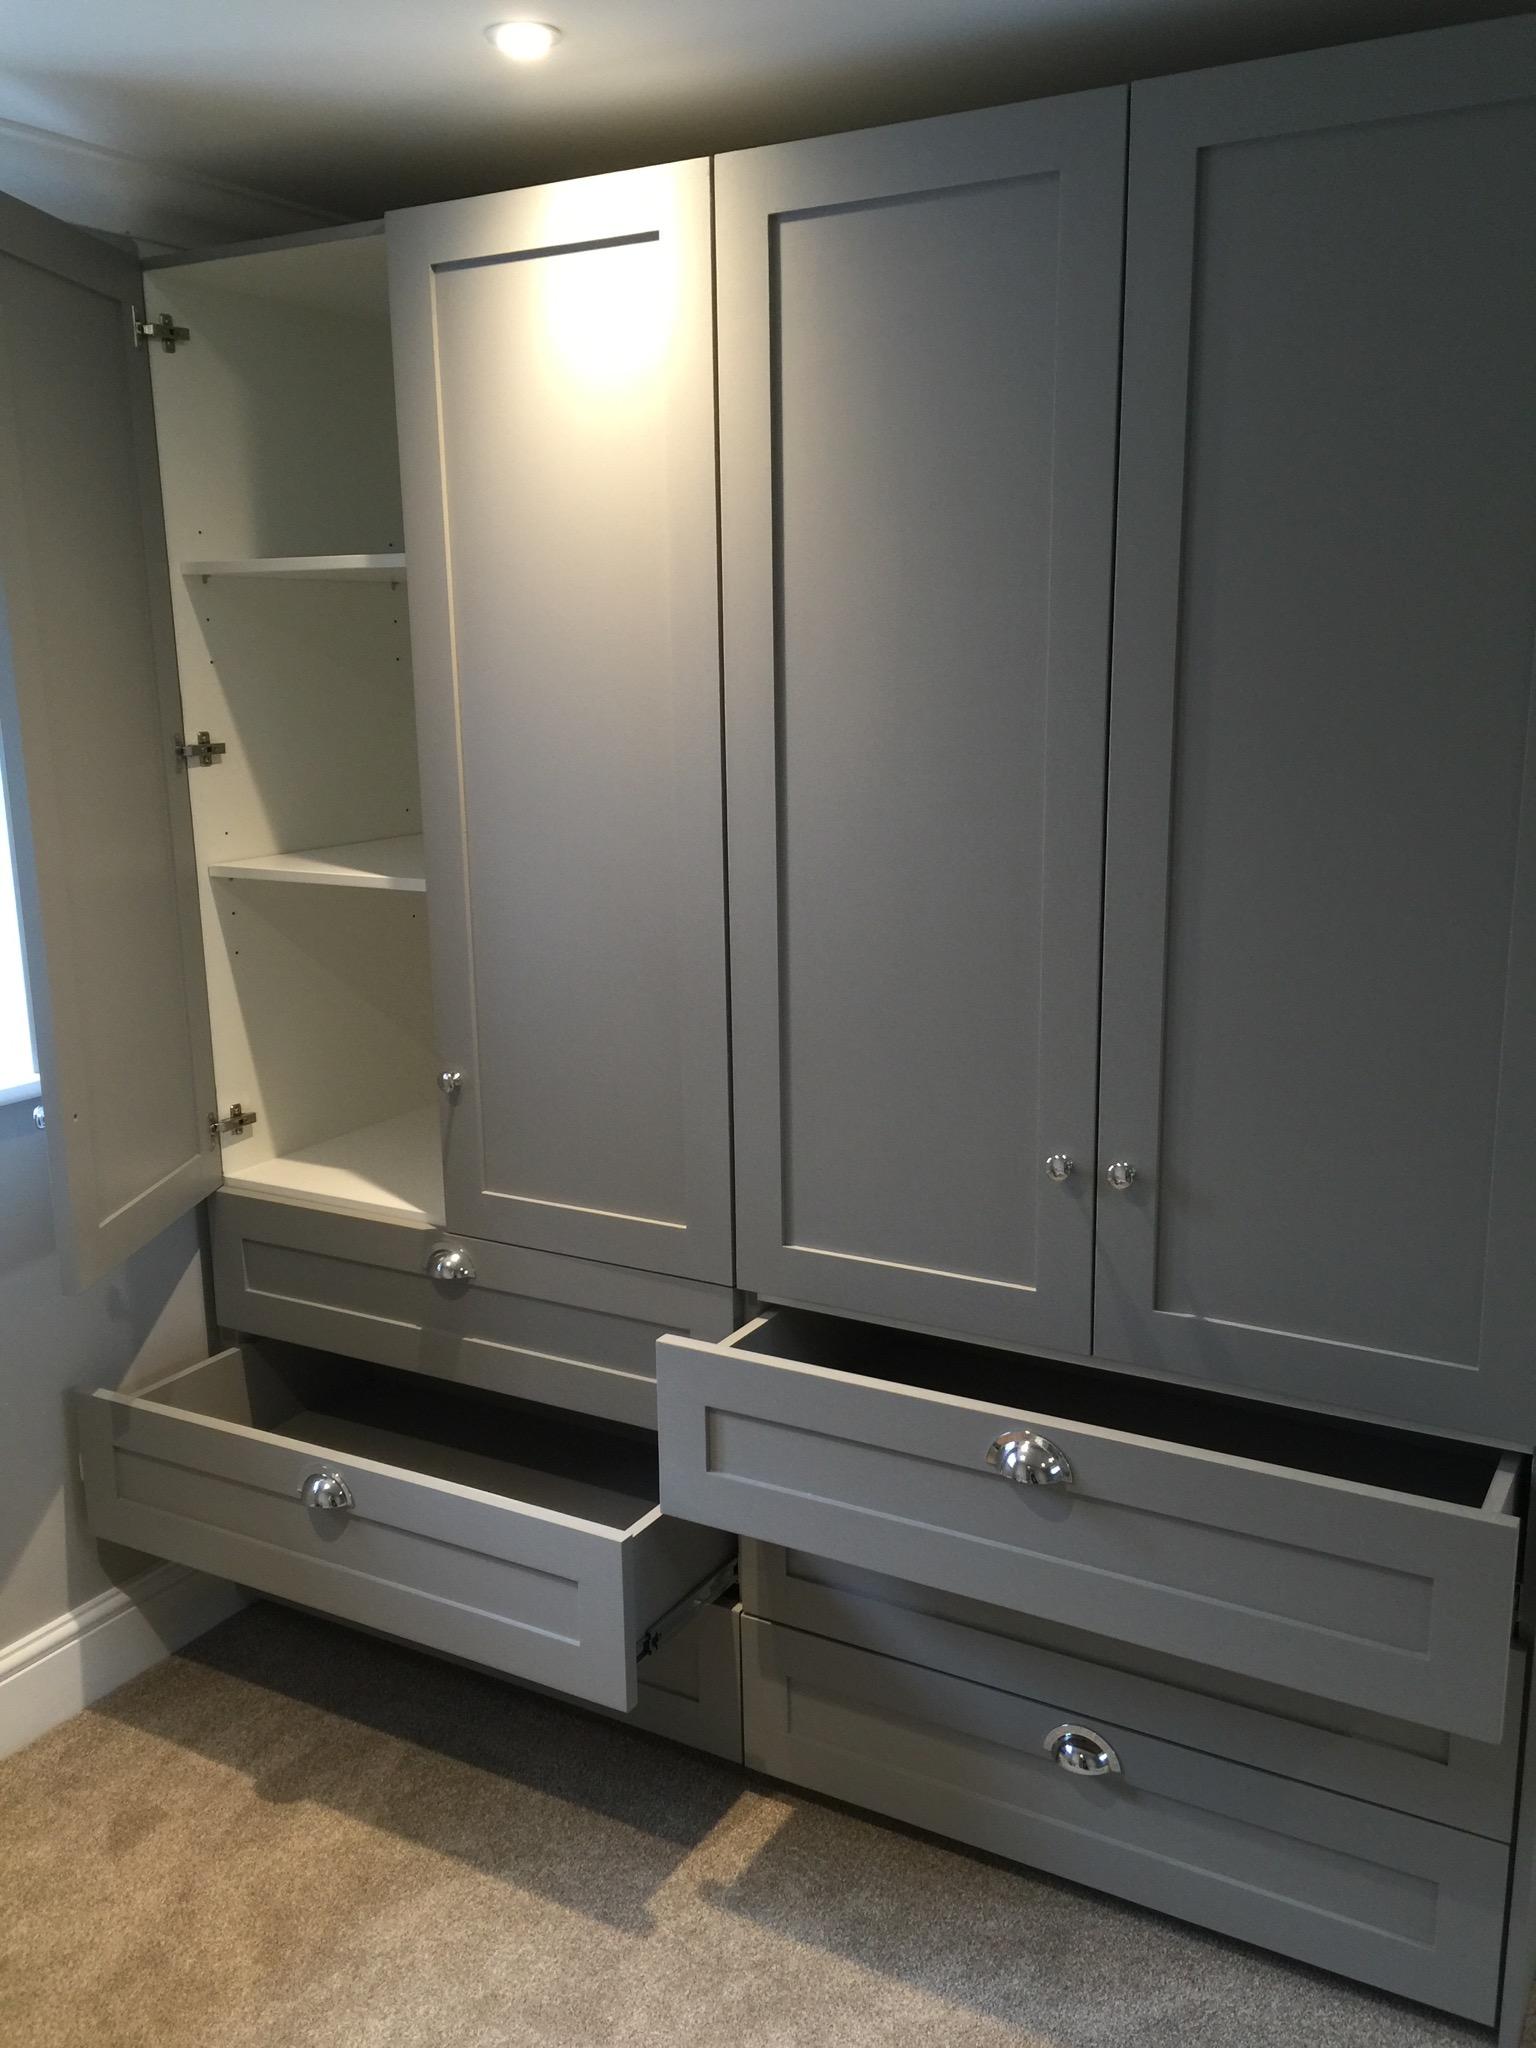 Panel effect wardrobes & drawers